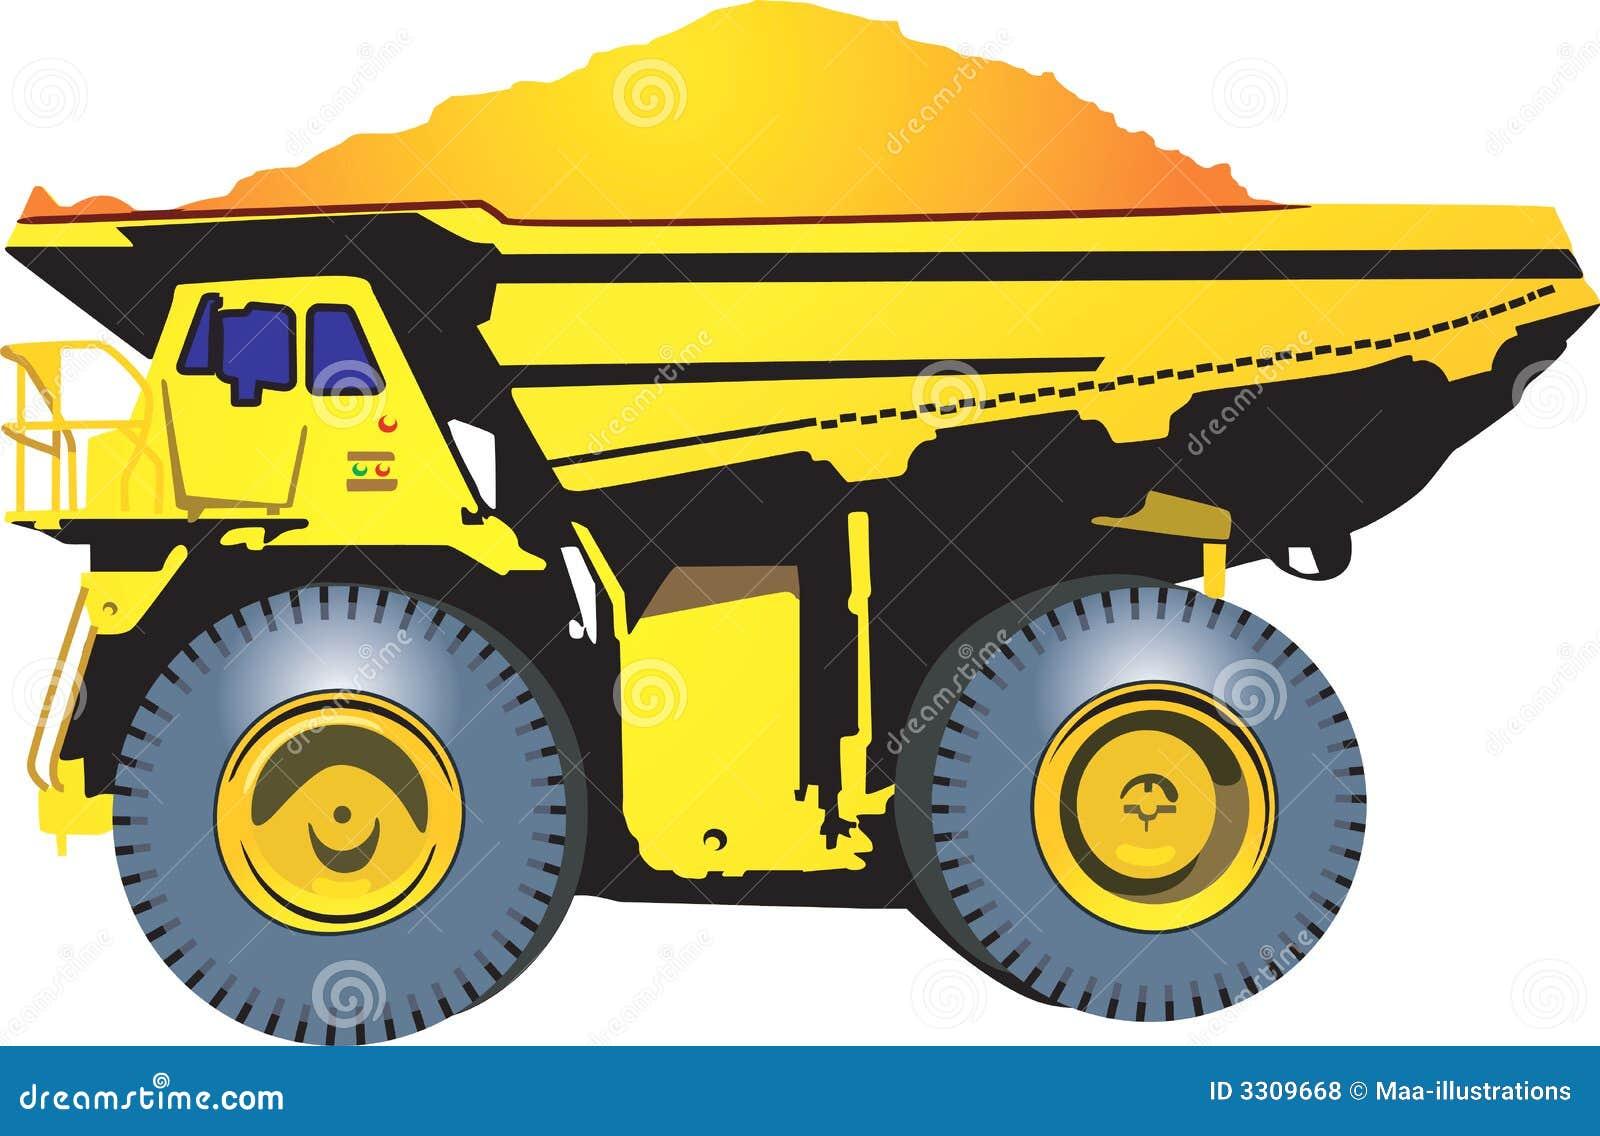 Heavy Goods Vehicle Royalty Free Stock Photos Image 3309668